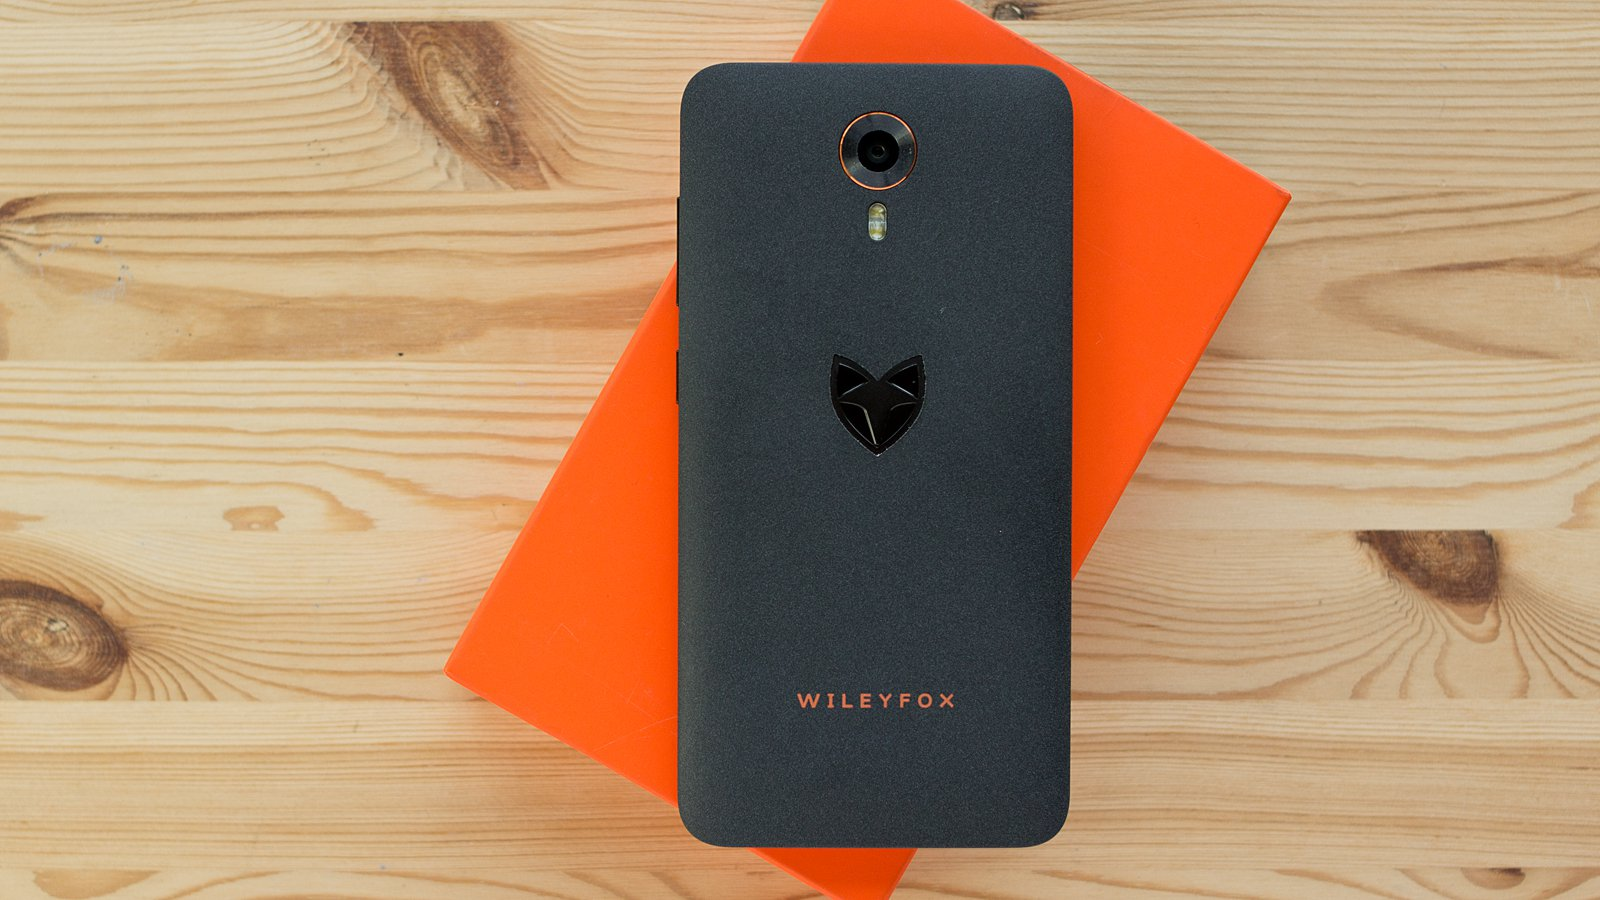 wileyfox_phone_review_28.jpg